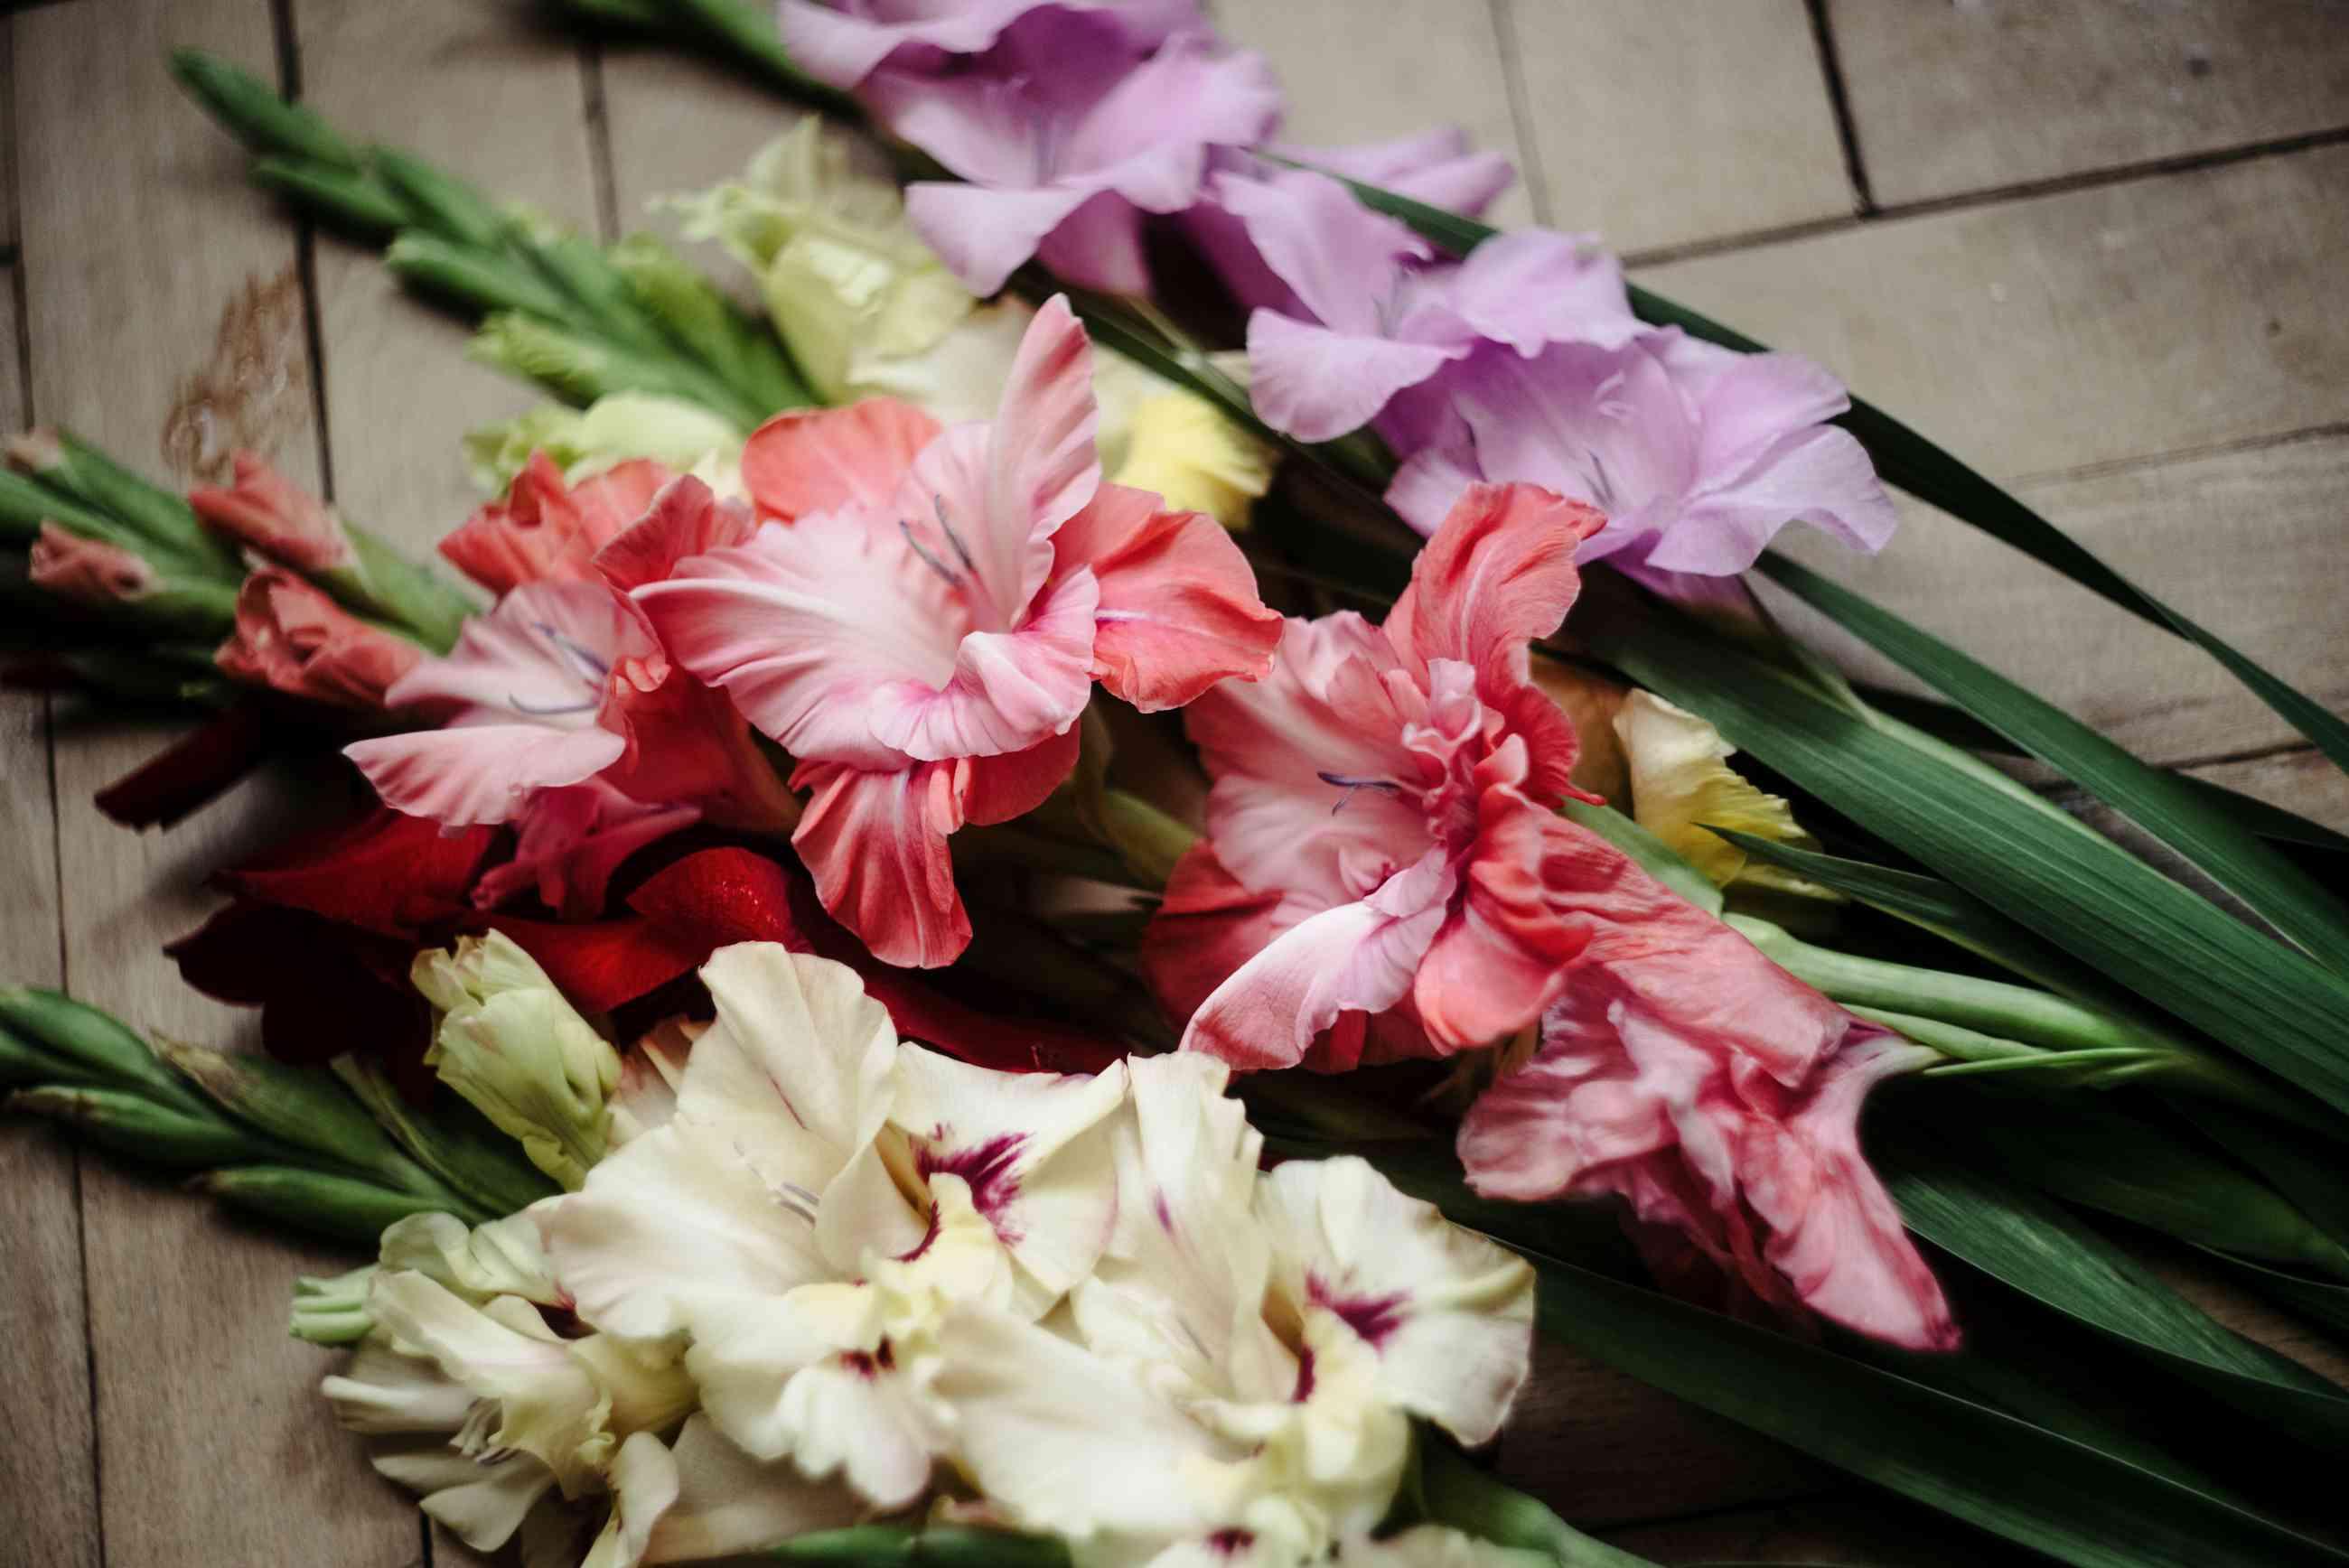 beautiful bouquet of colorful gladioli